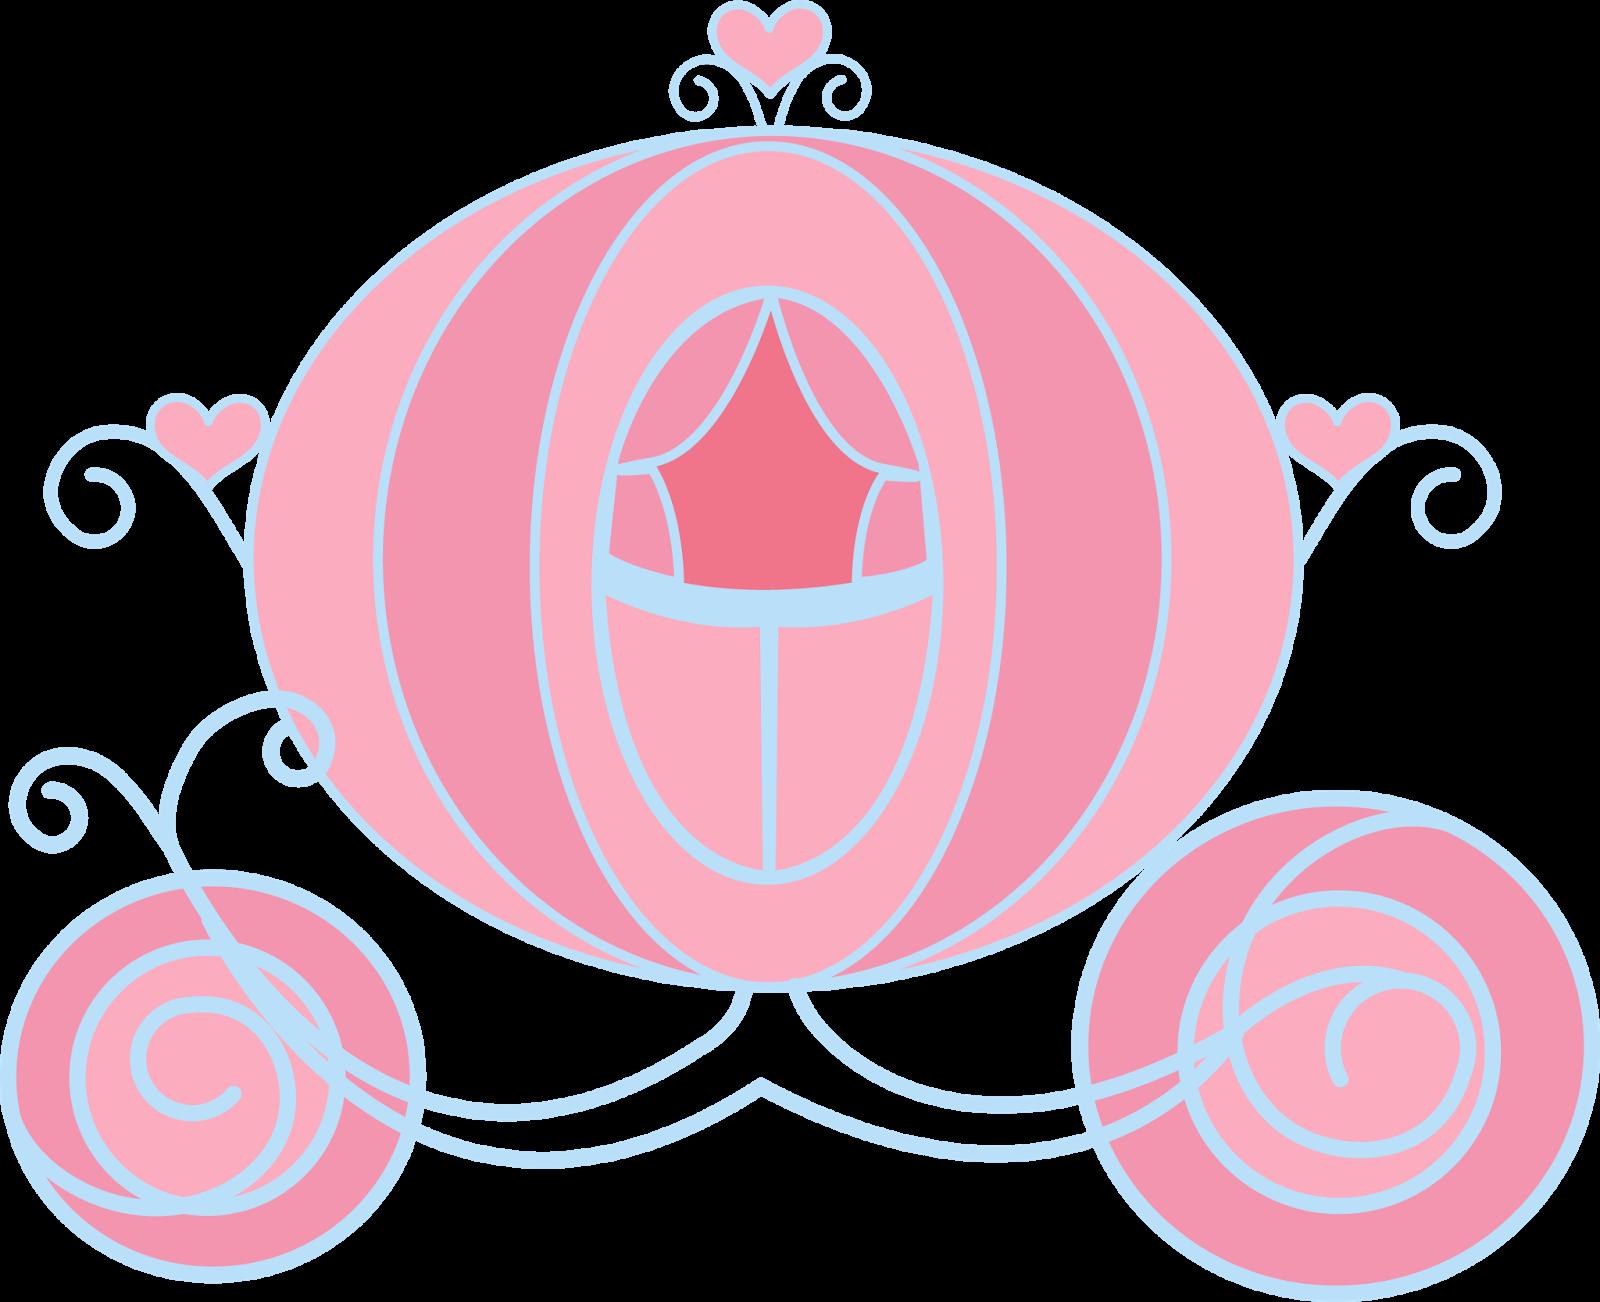 magic cinderella babies clip art oh my baby cinderella pumpkin carriage clipart princess carriage clipart